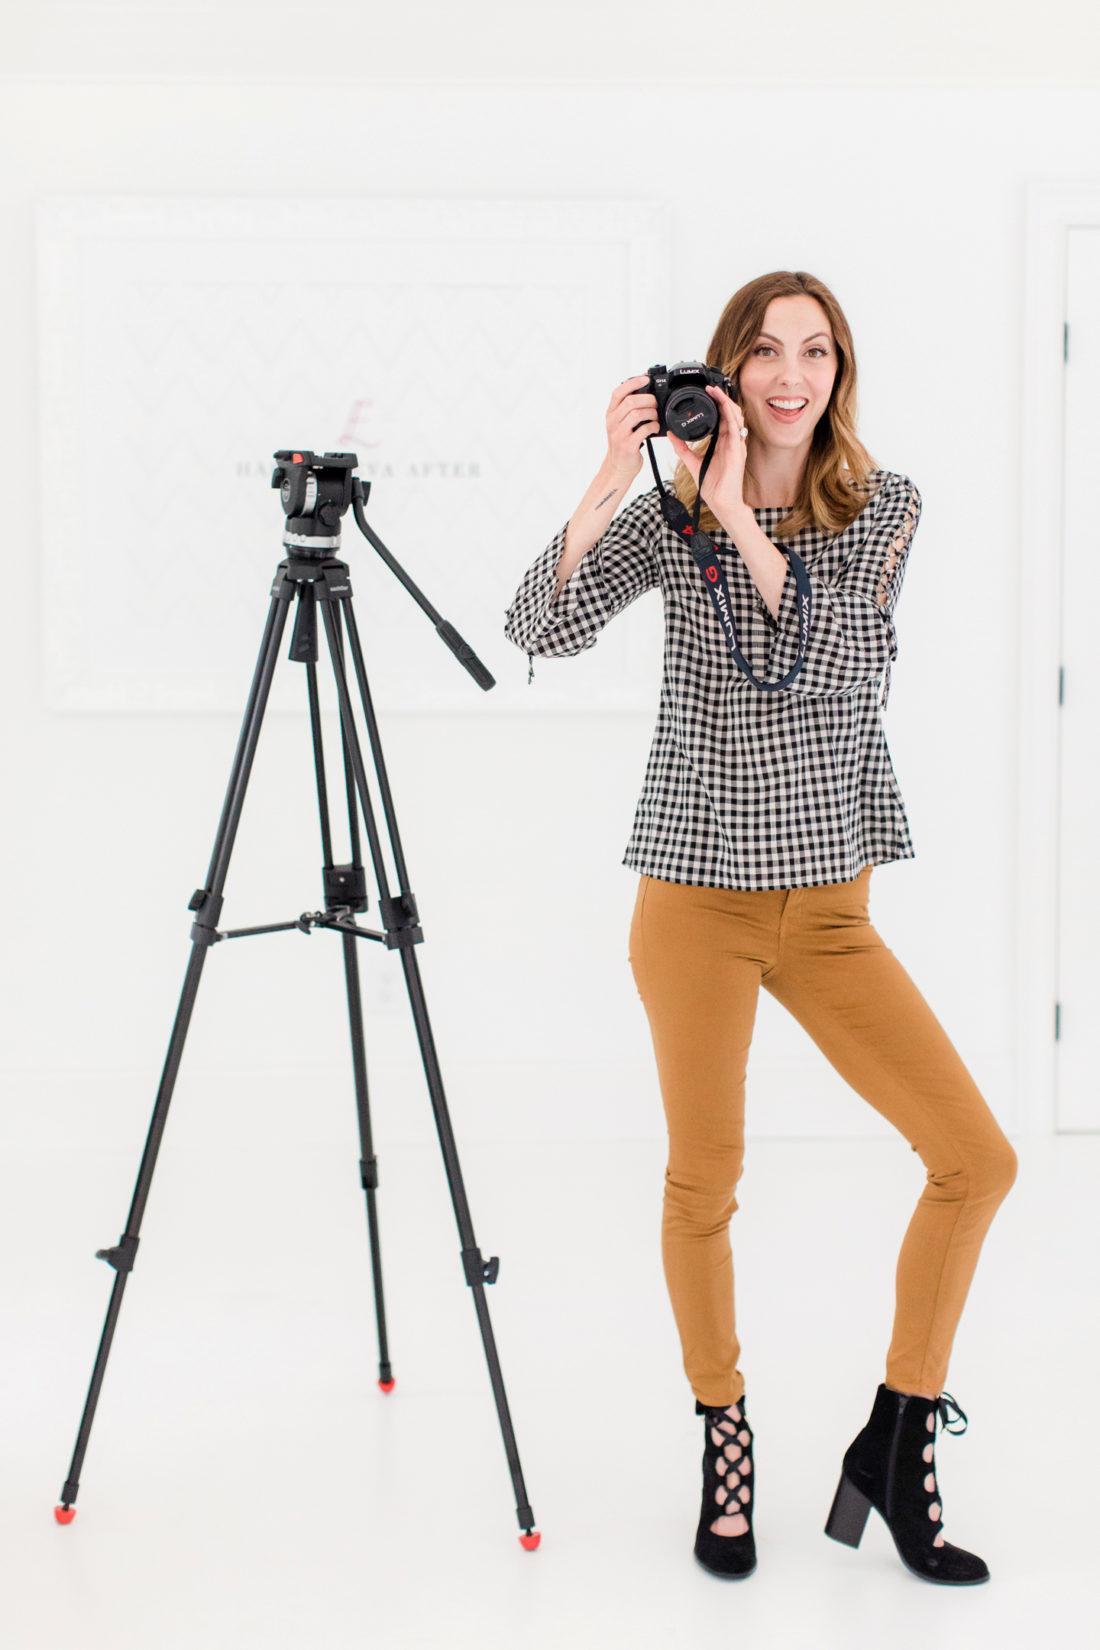 Eva Amurri Martino stands in her photography studio with her camera equipment